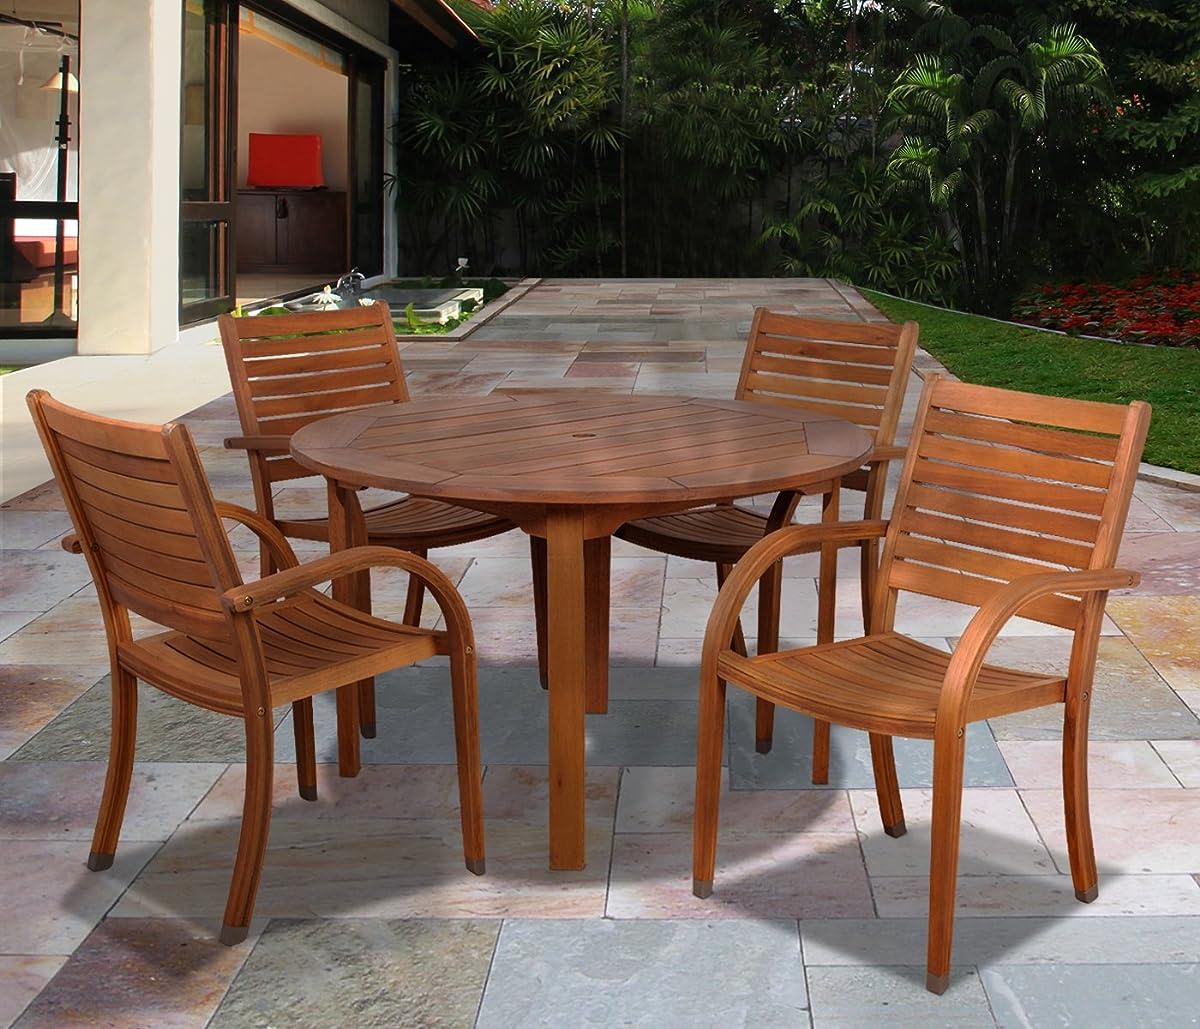 Amazonia Arizona 5-Piece Eucalyptus Round Dining Set